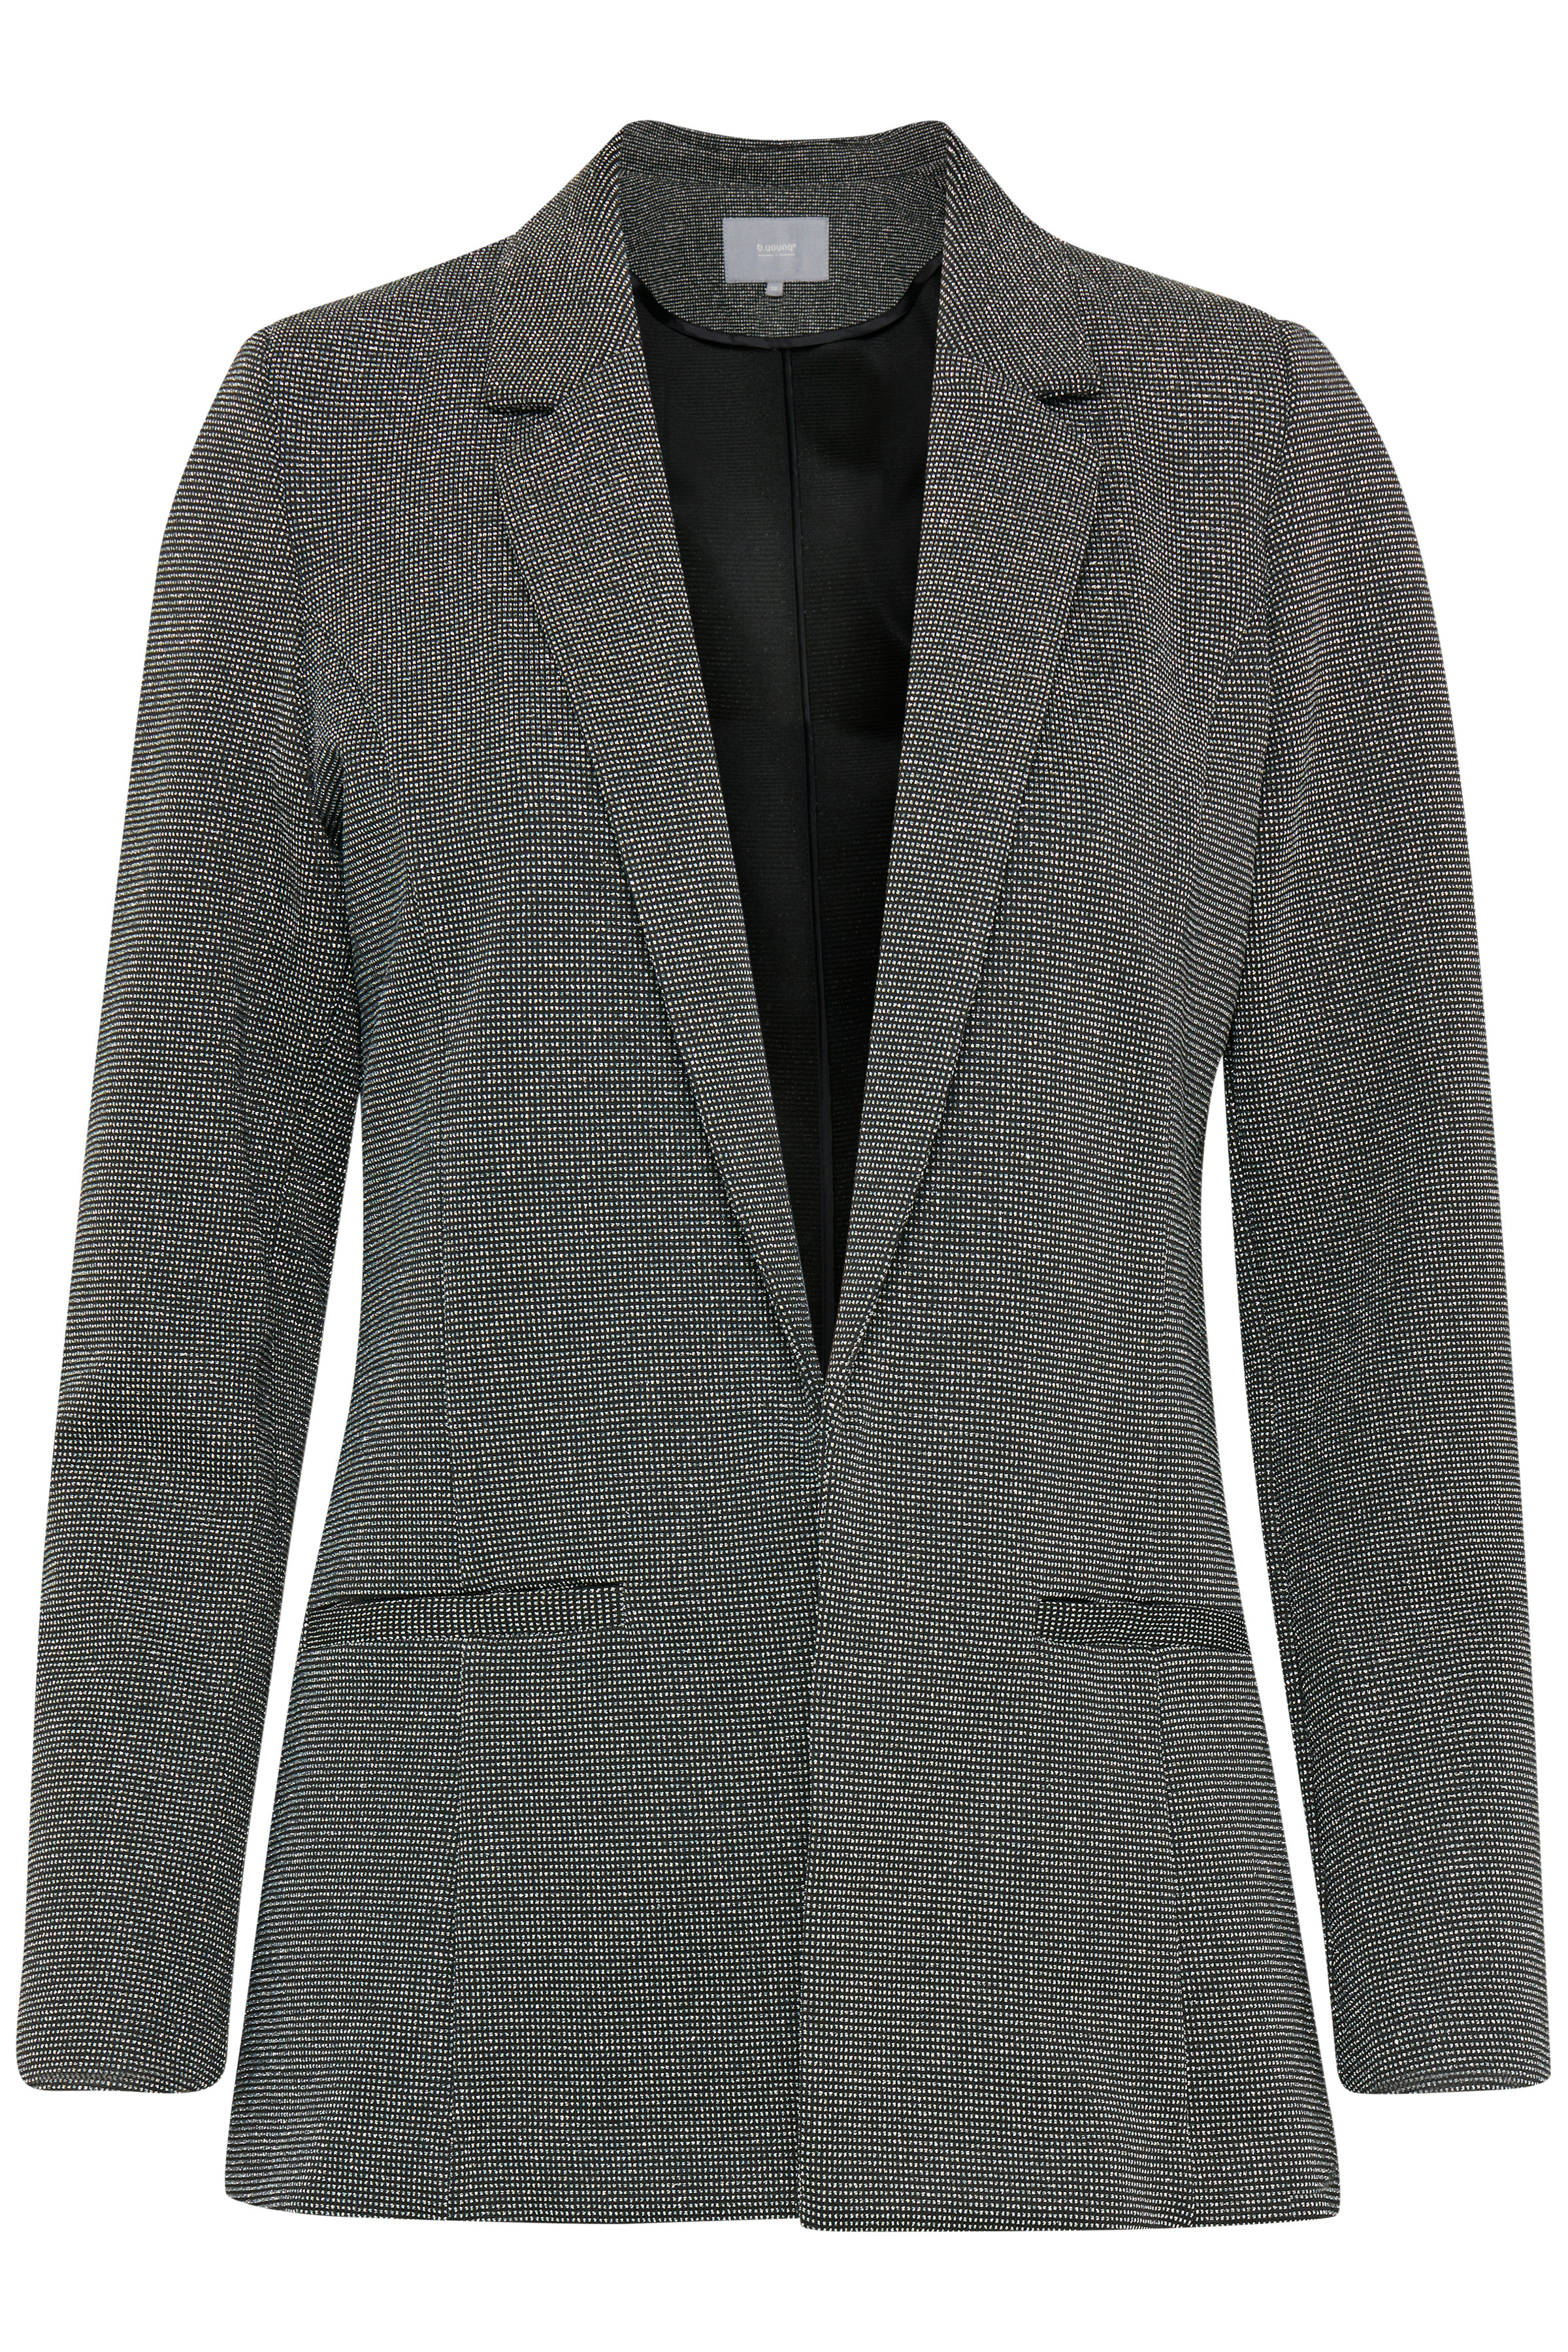 Black w. silver Blazer från b.young – Köp Black w. silver Blazer från storlek 34-46 här